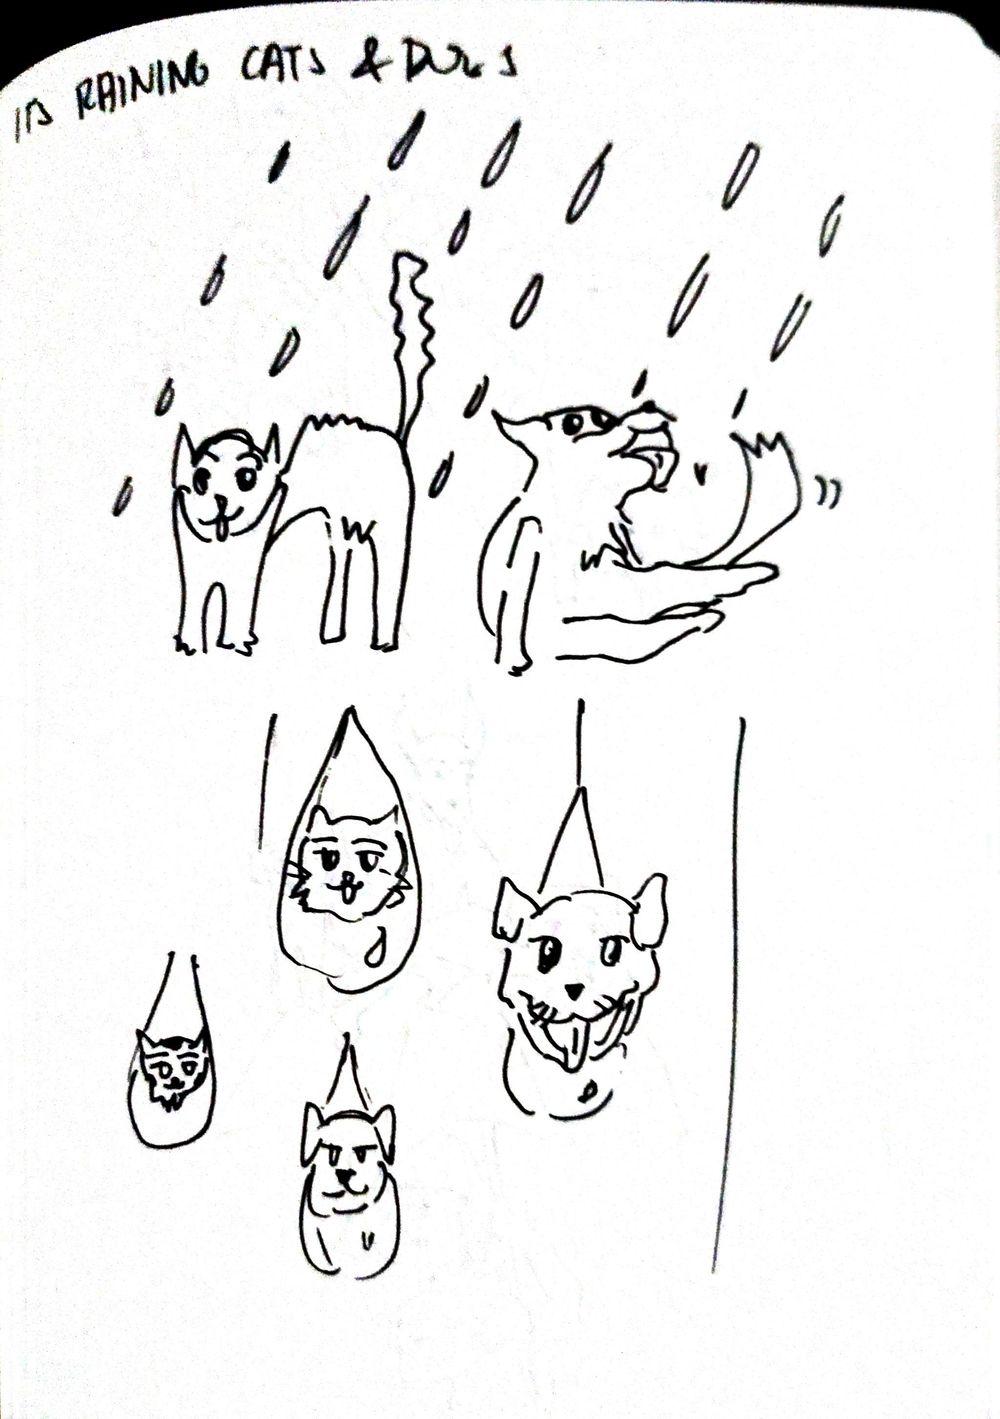 Idiom Illustration - image 1 - student project